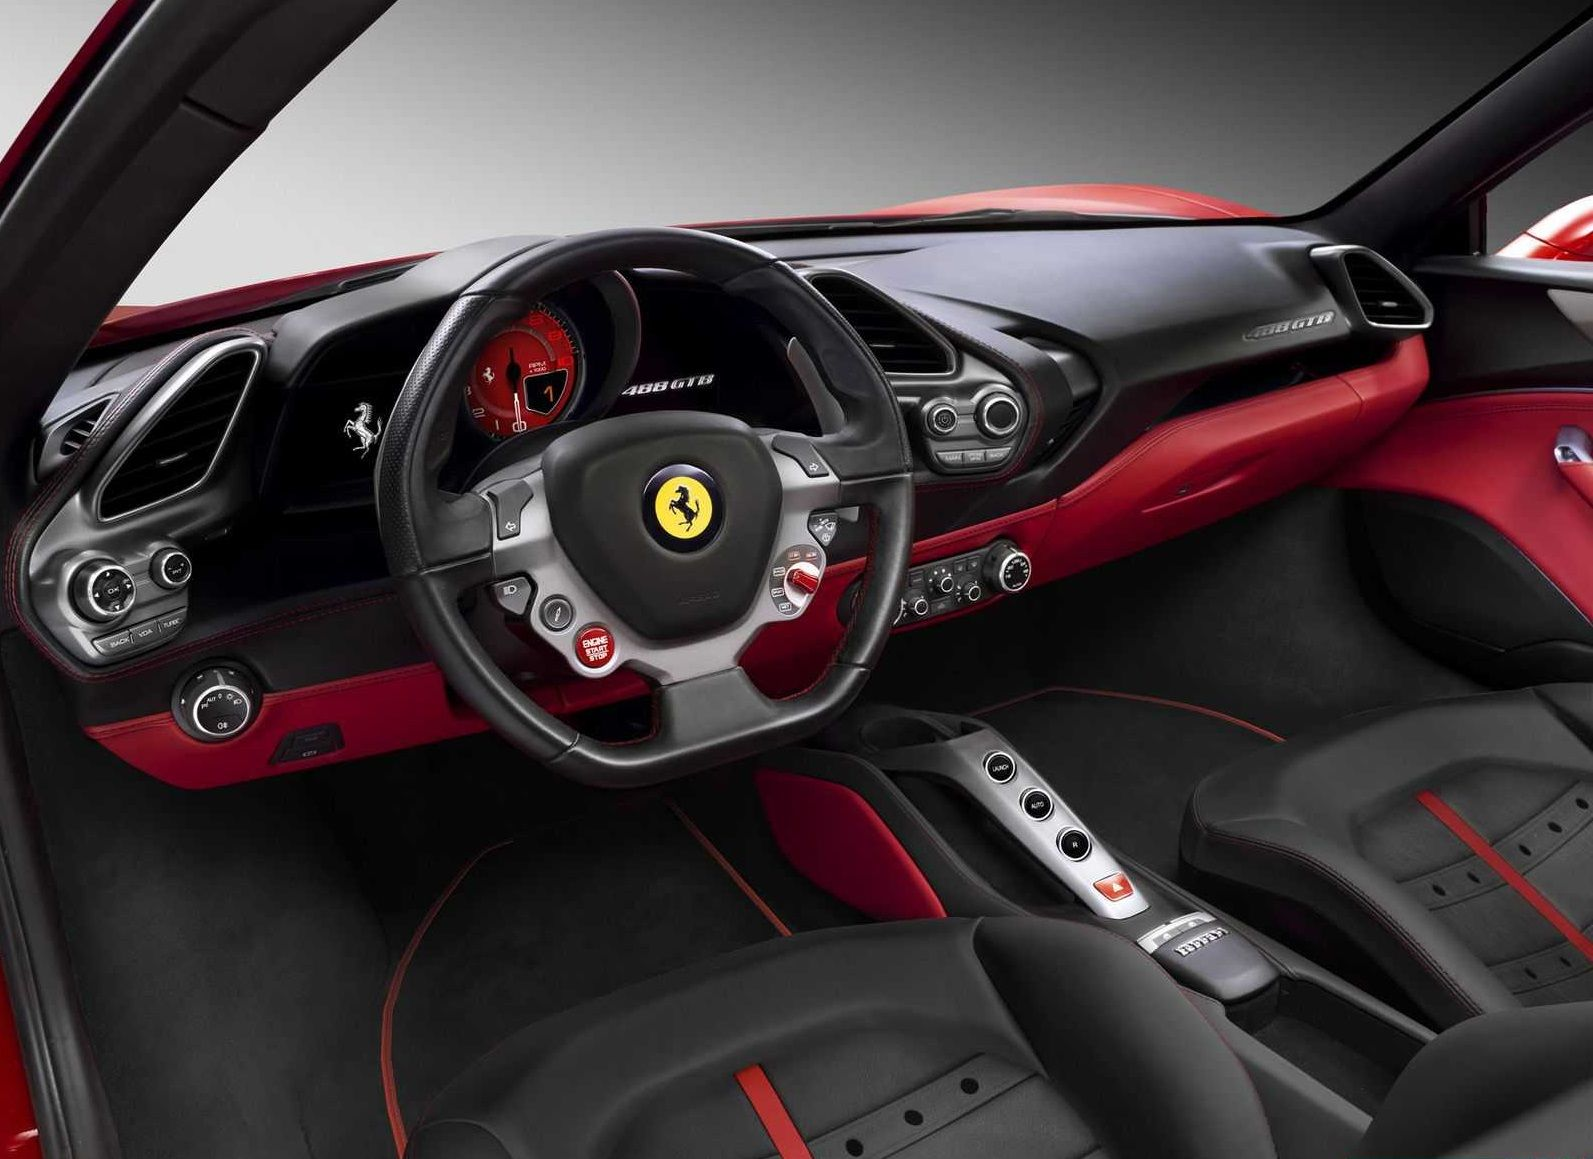 Assistive Panels On Steering Wheel With Automatic Gear Transmission Pivod Ferrari Car 488 Gtb Ferrari 488